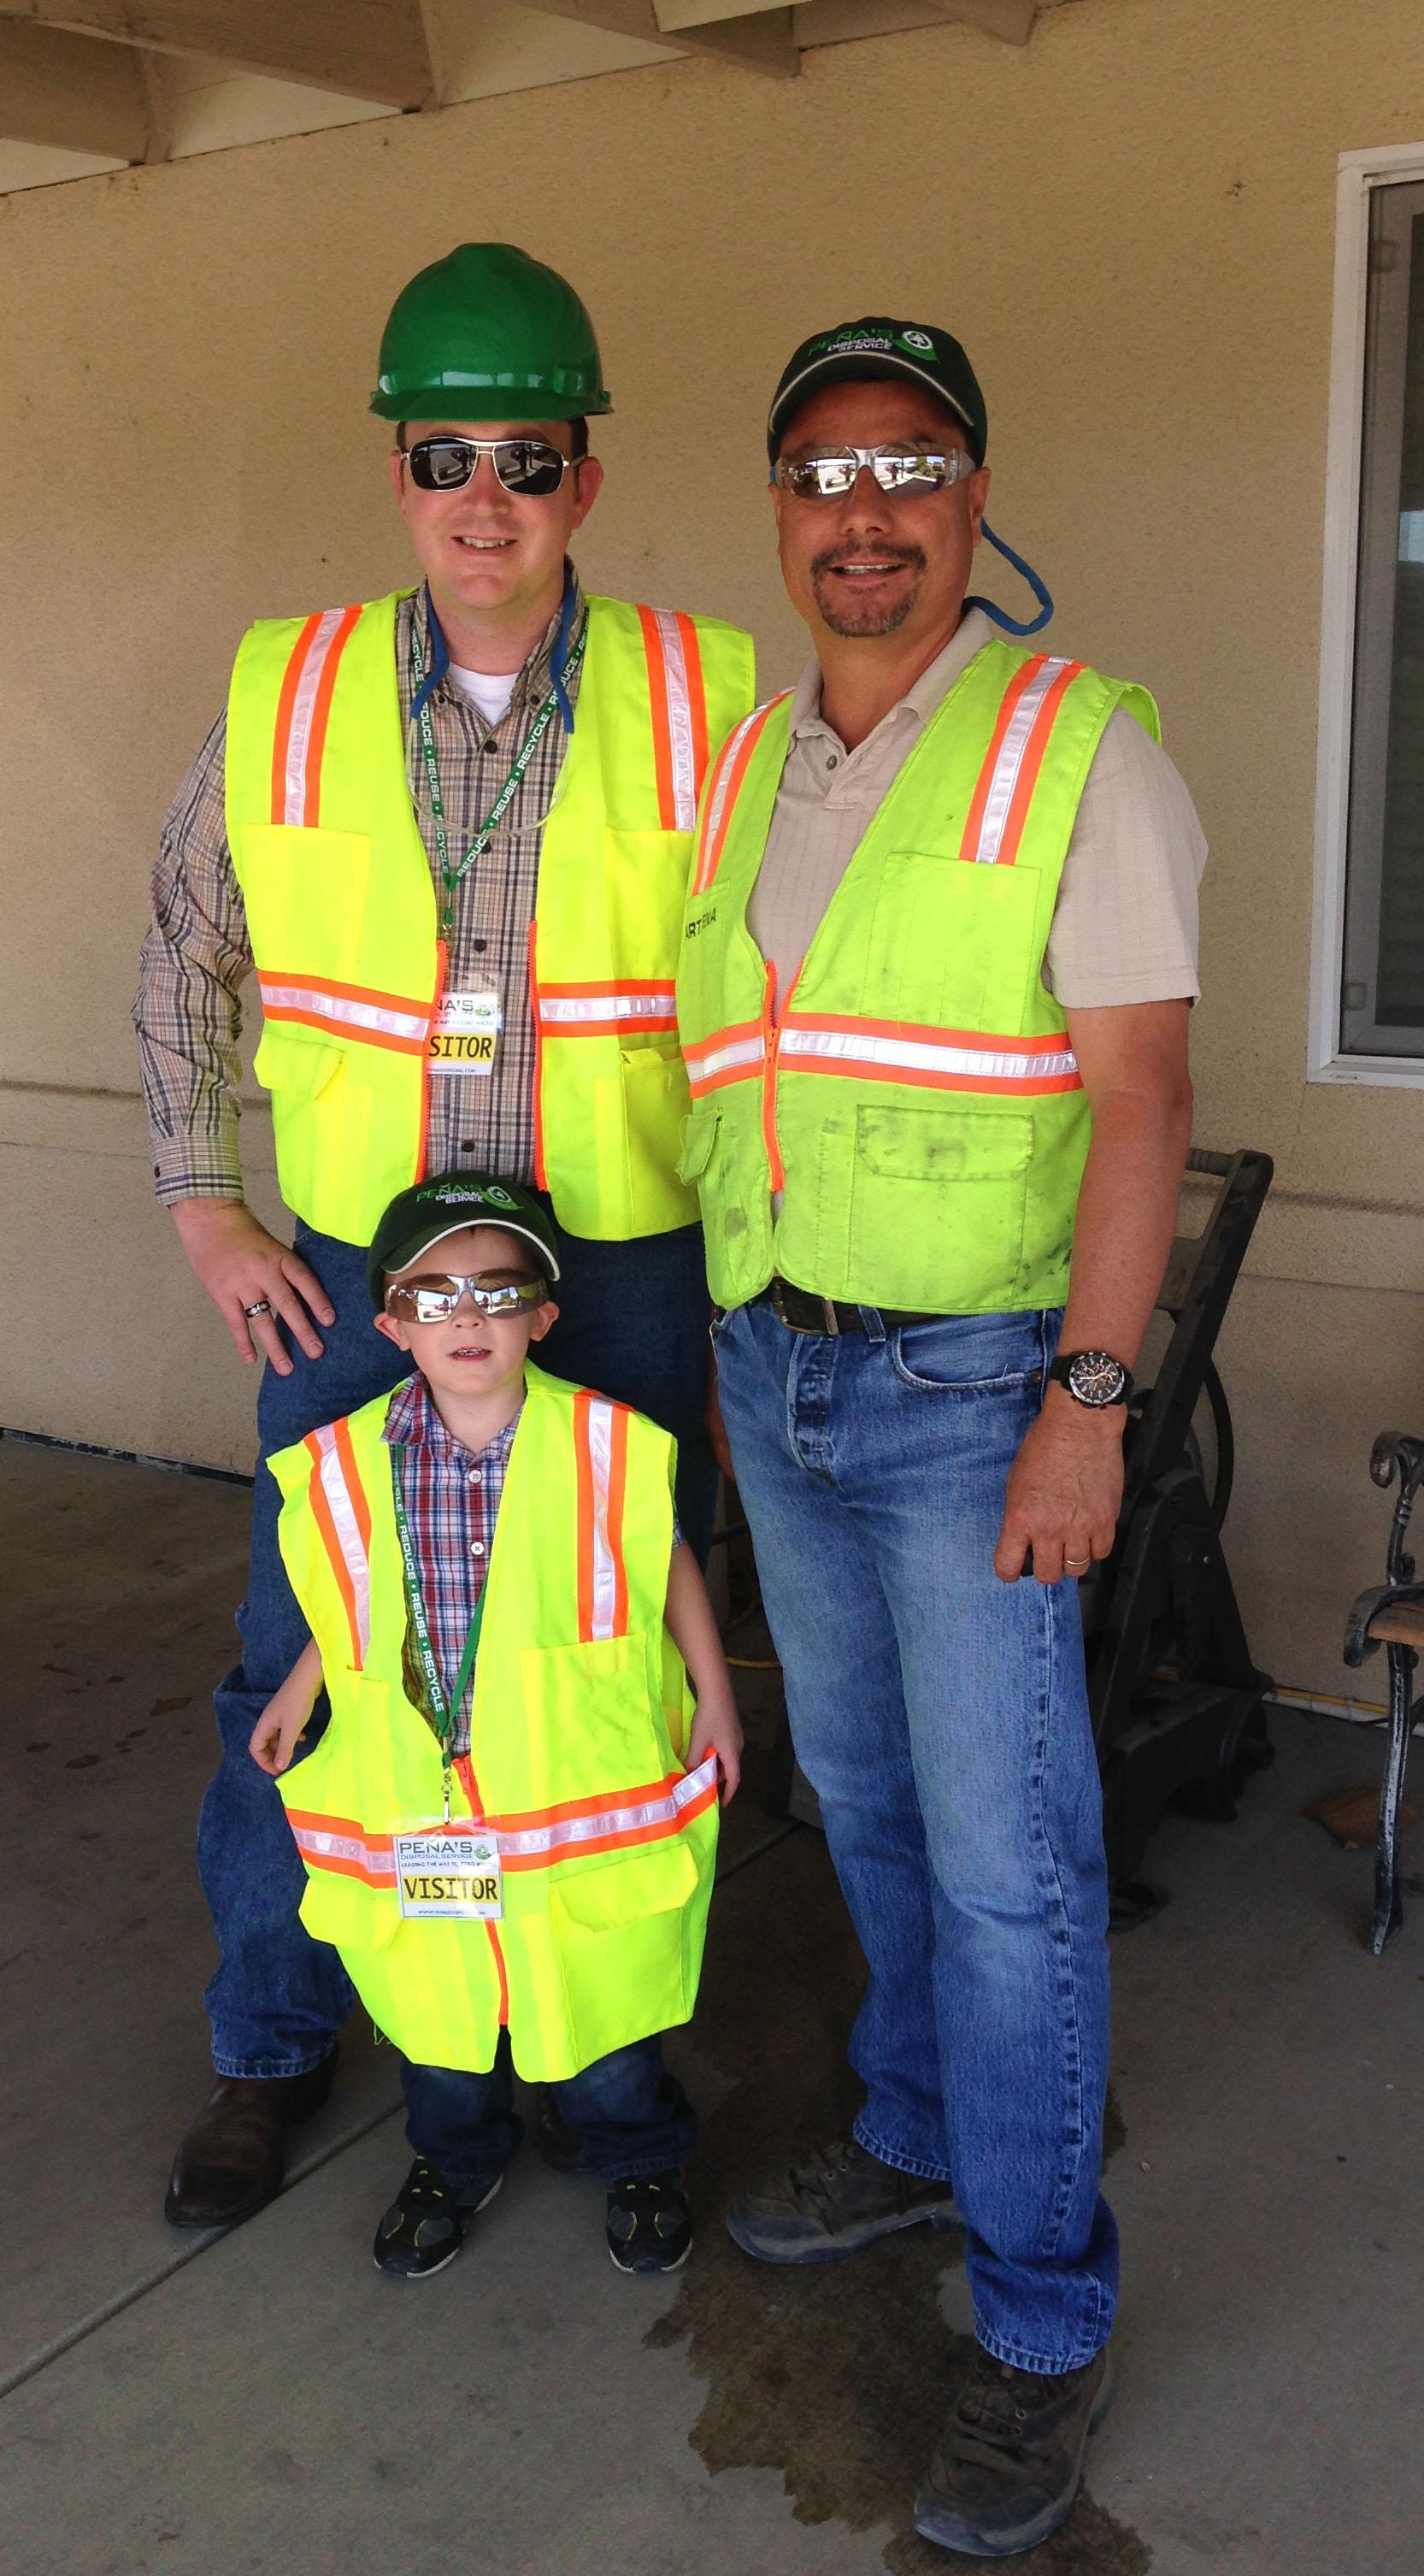 Assemblyman Devon Mathis and his son visit Peña's Disposal